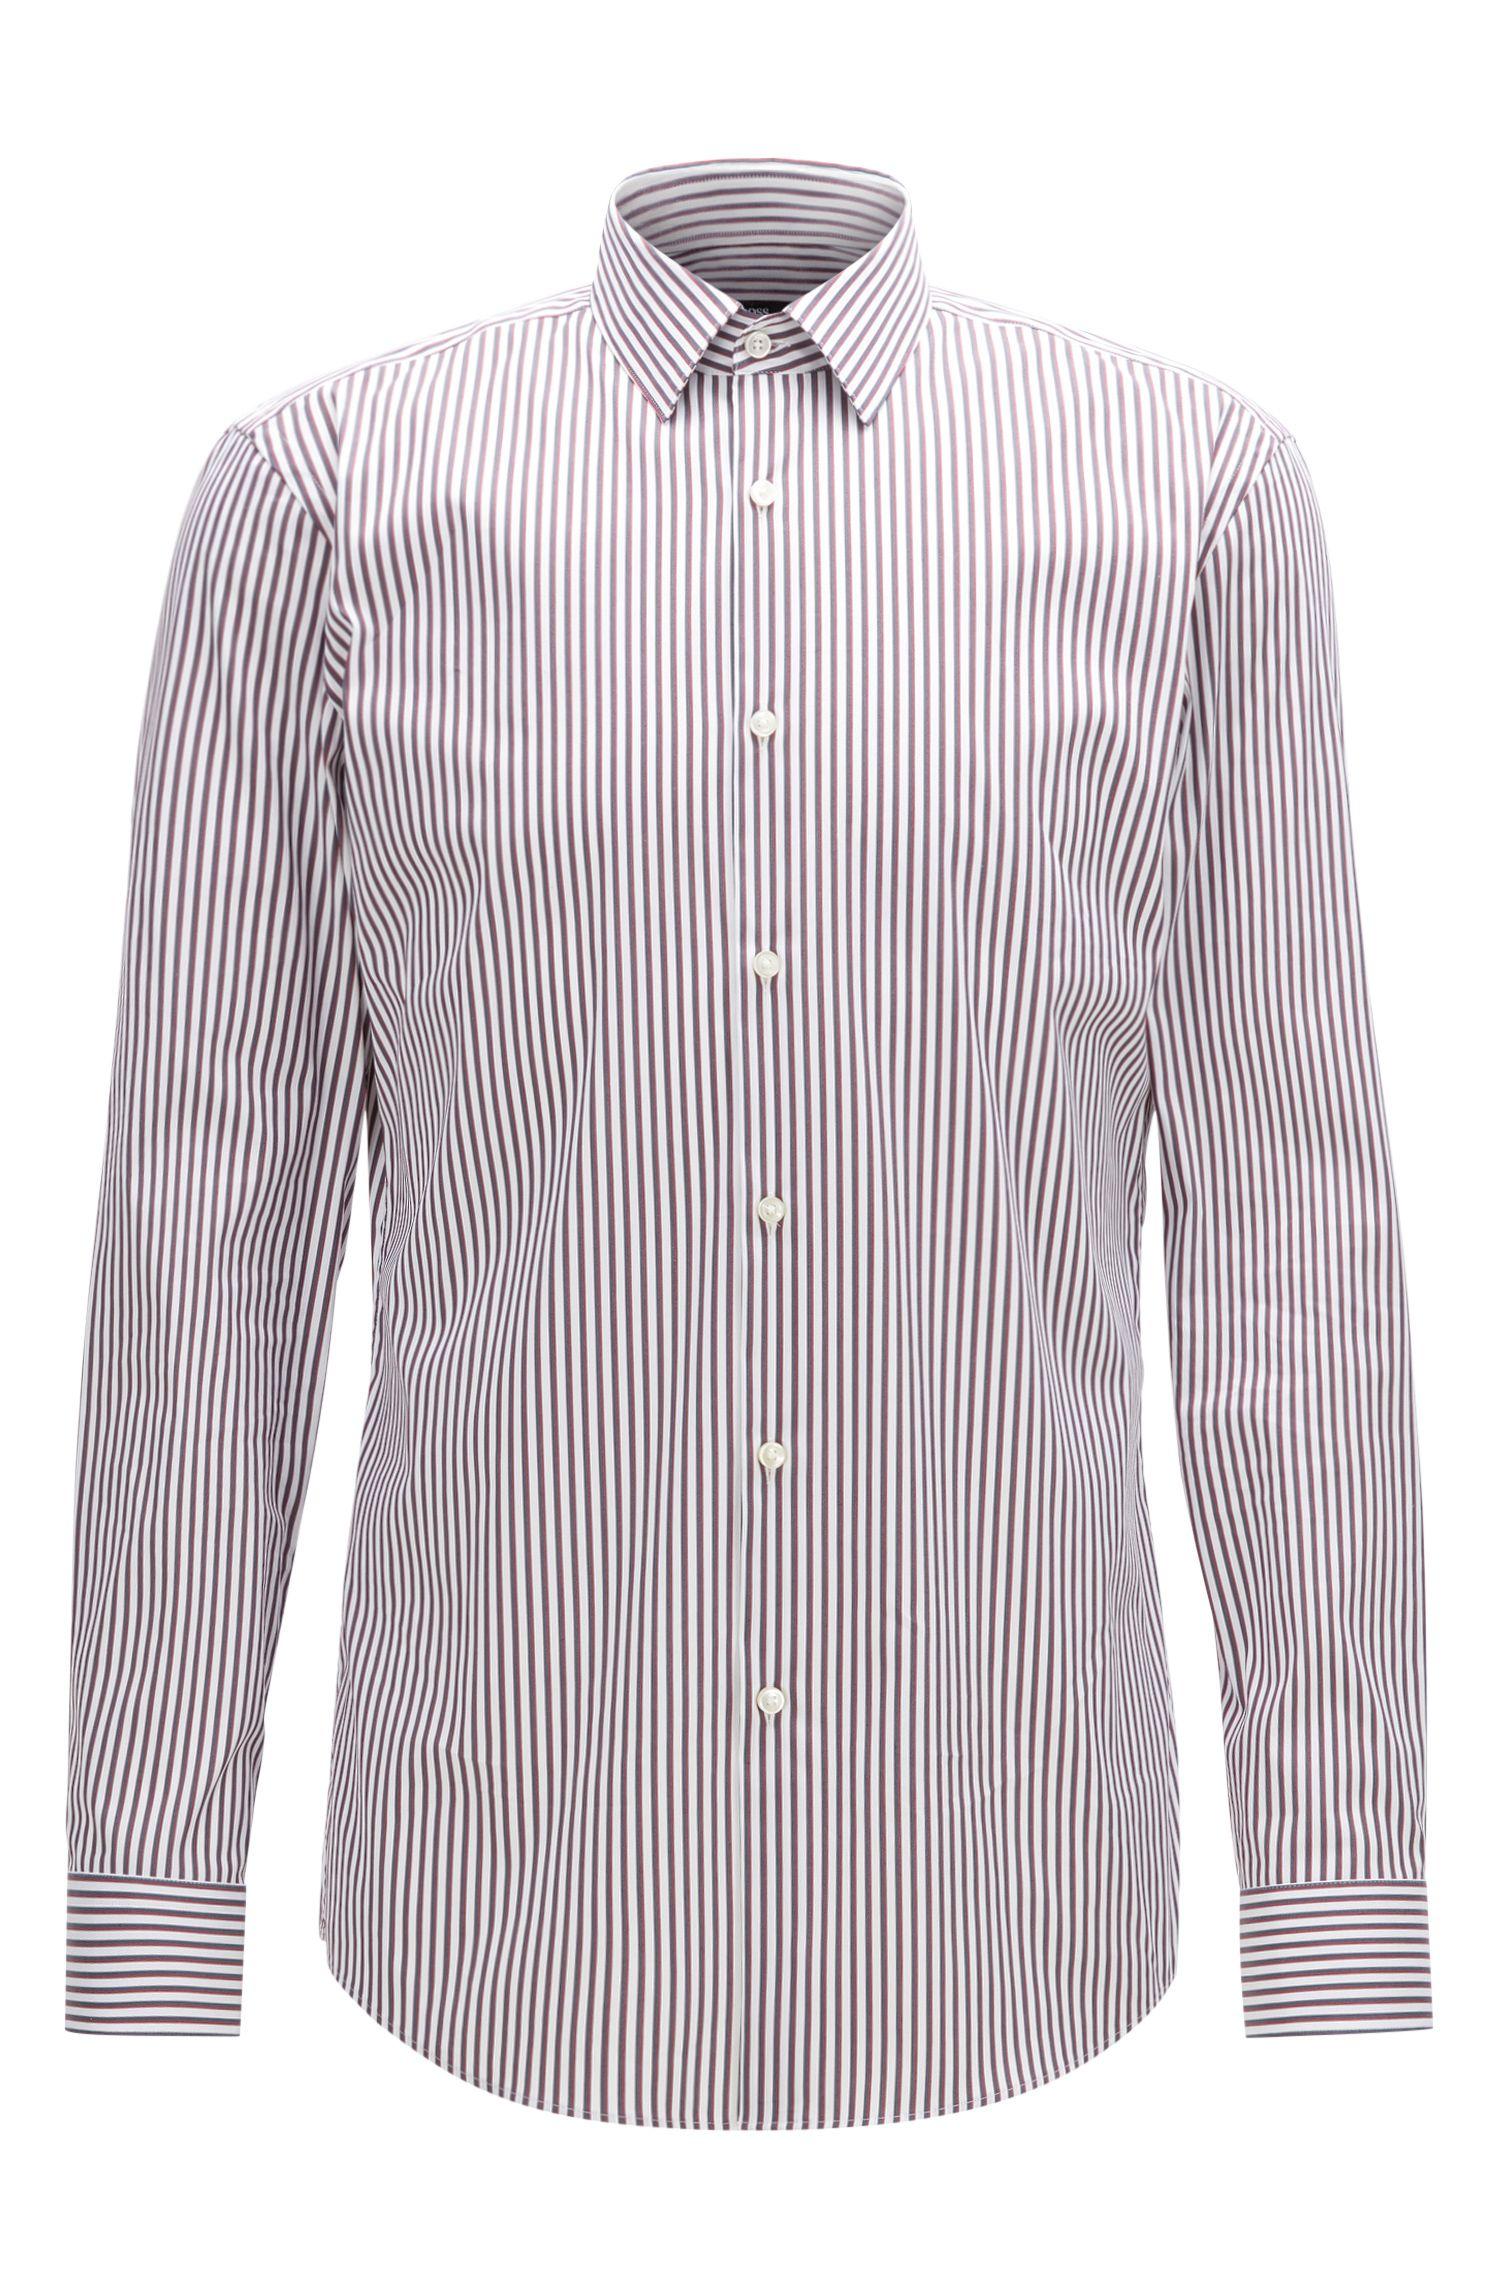 Striped Stretch Cotton Dress Shirt, Slim Fit | Isko